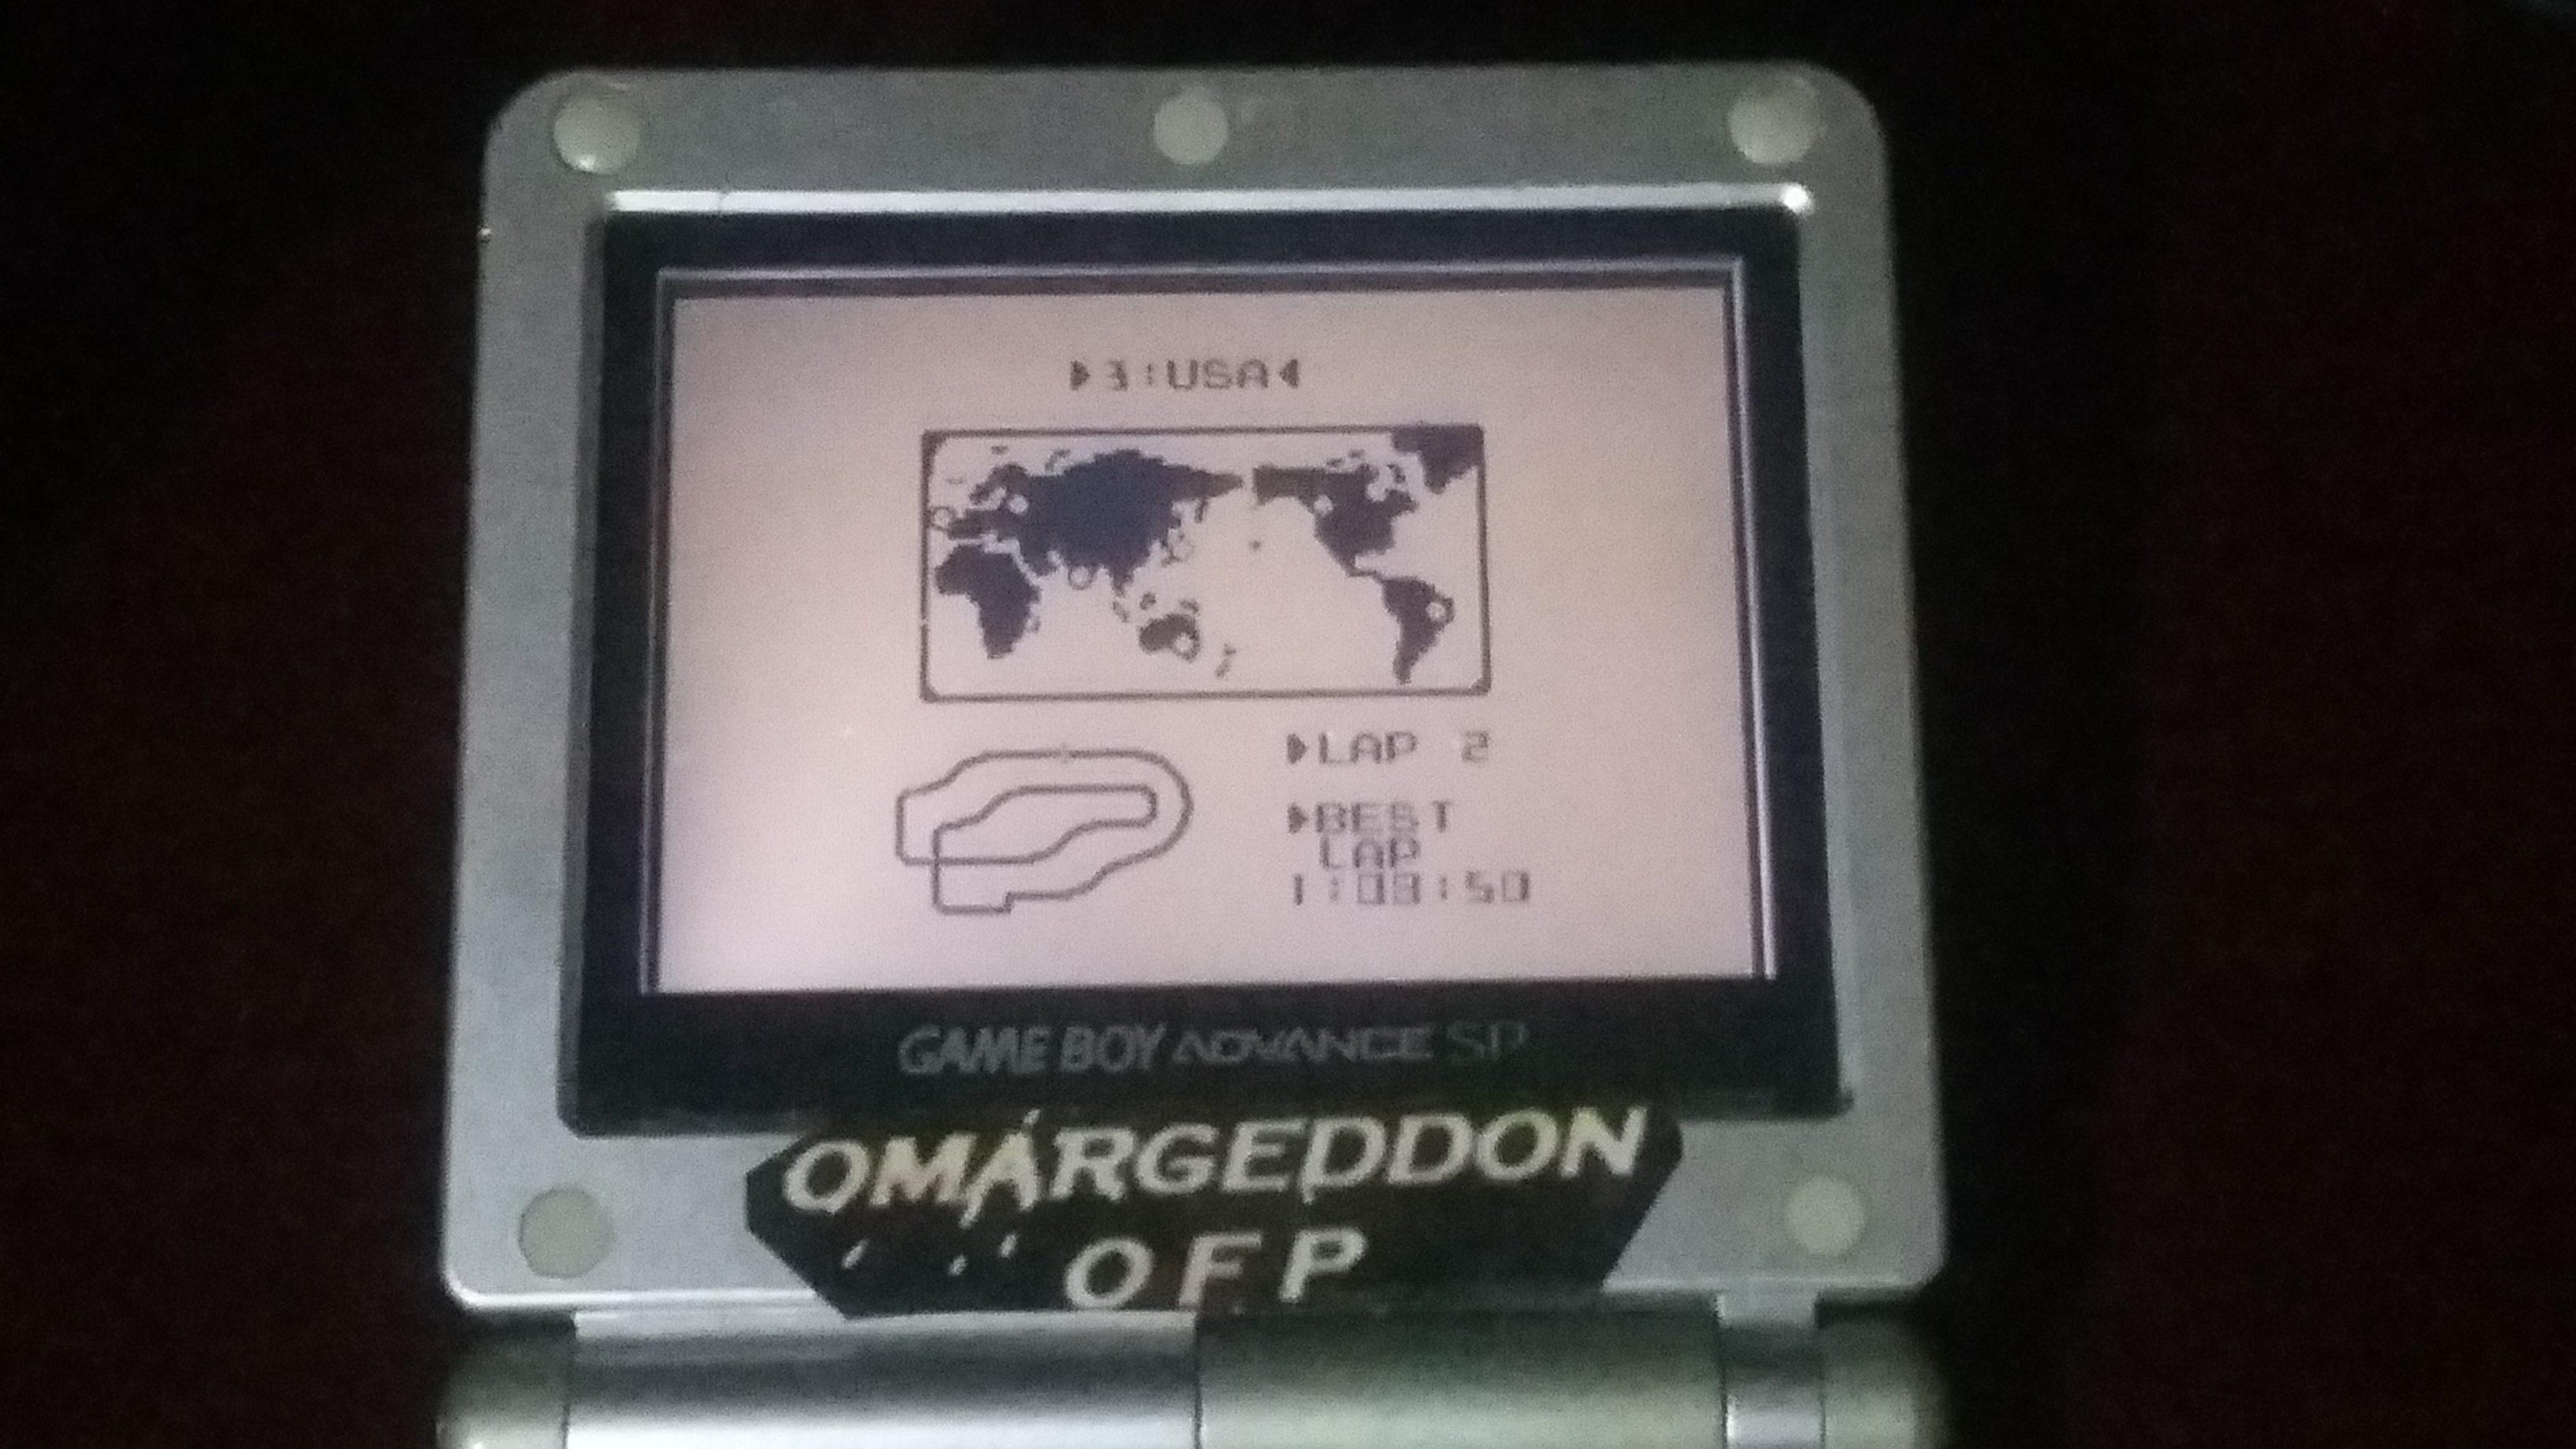 omargeddon: F-1 Race: Time Trials: Single: U.S.A. [Best Lap] (Game Boy) 0:01:08.5 points on 2018-09-07 23:20:22